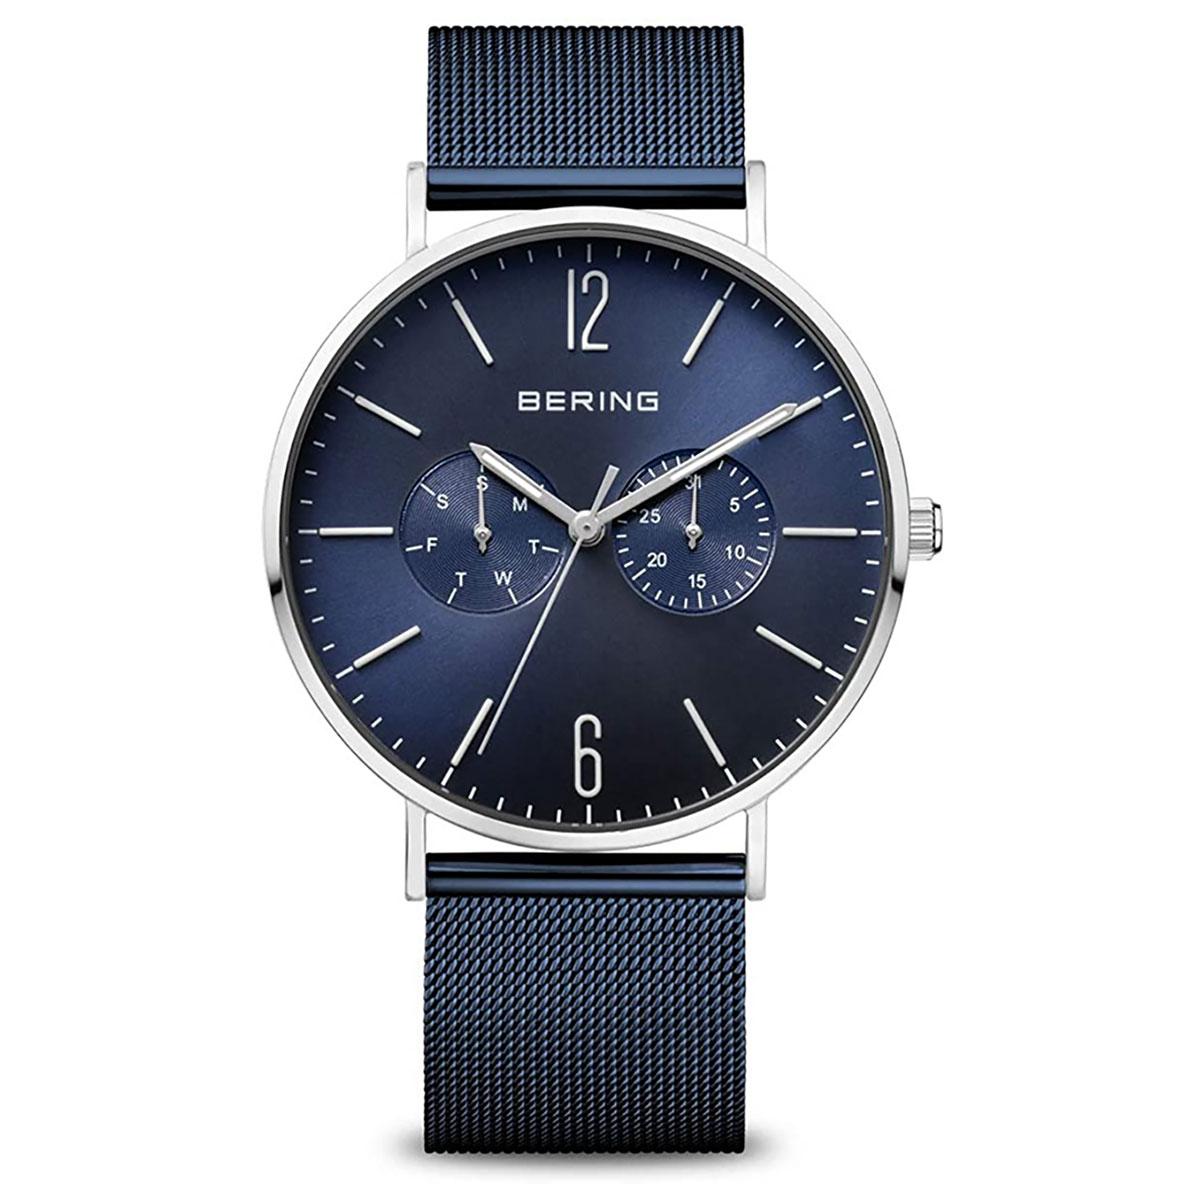 BERING-Herren-Analog-Quarz-Uhr-mit-Edelstahl-Armband-14240-303